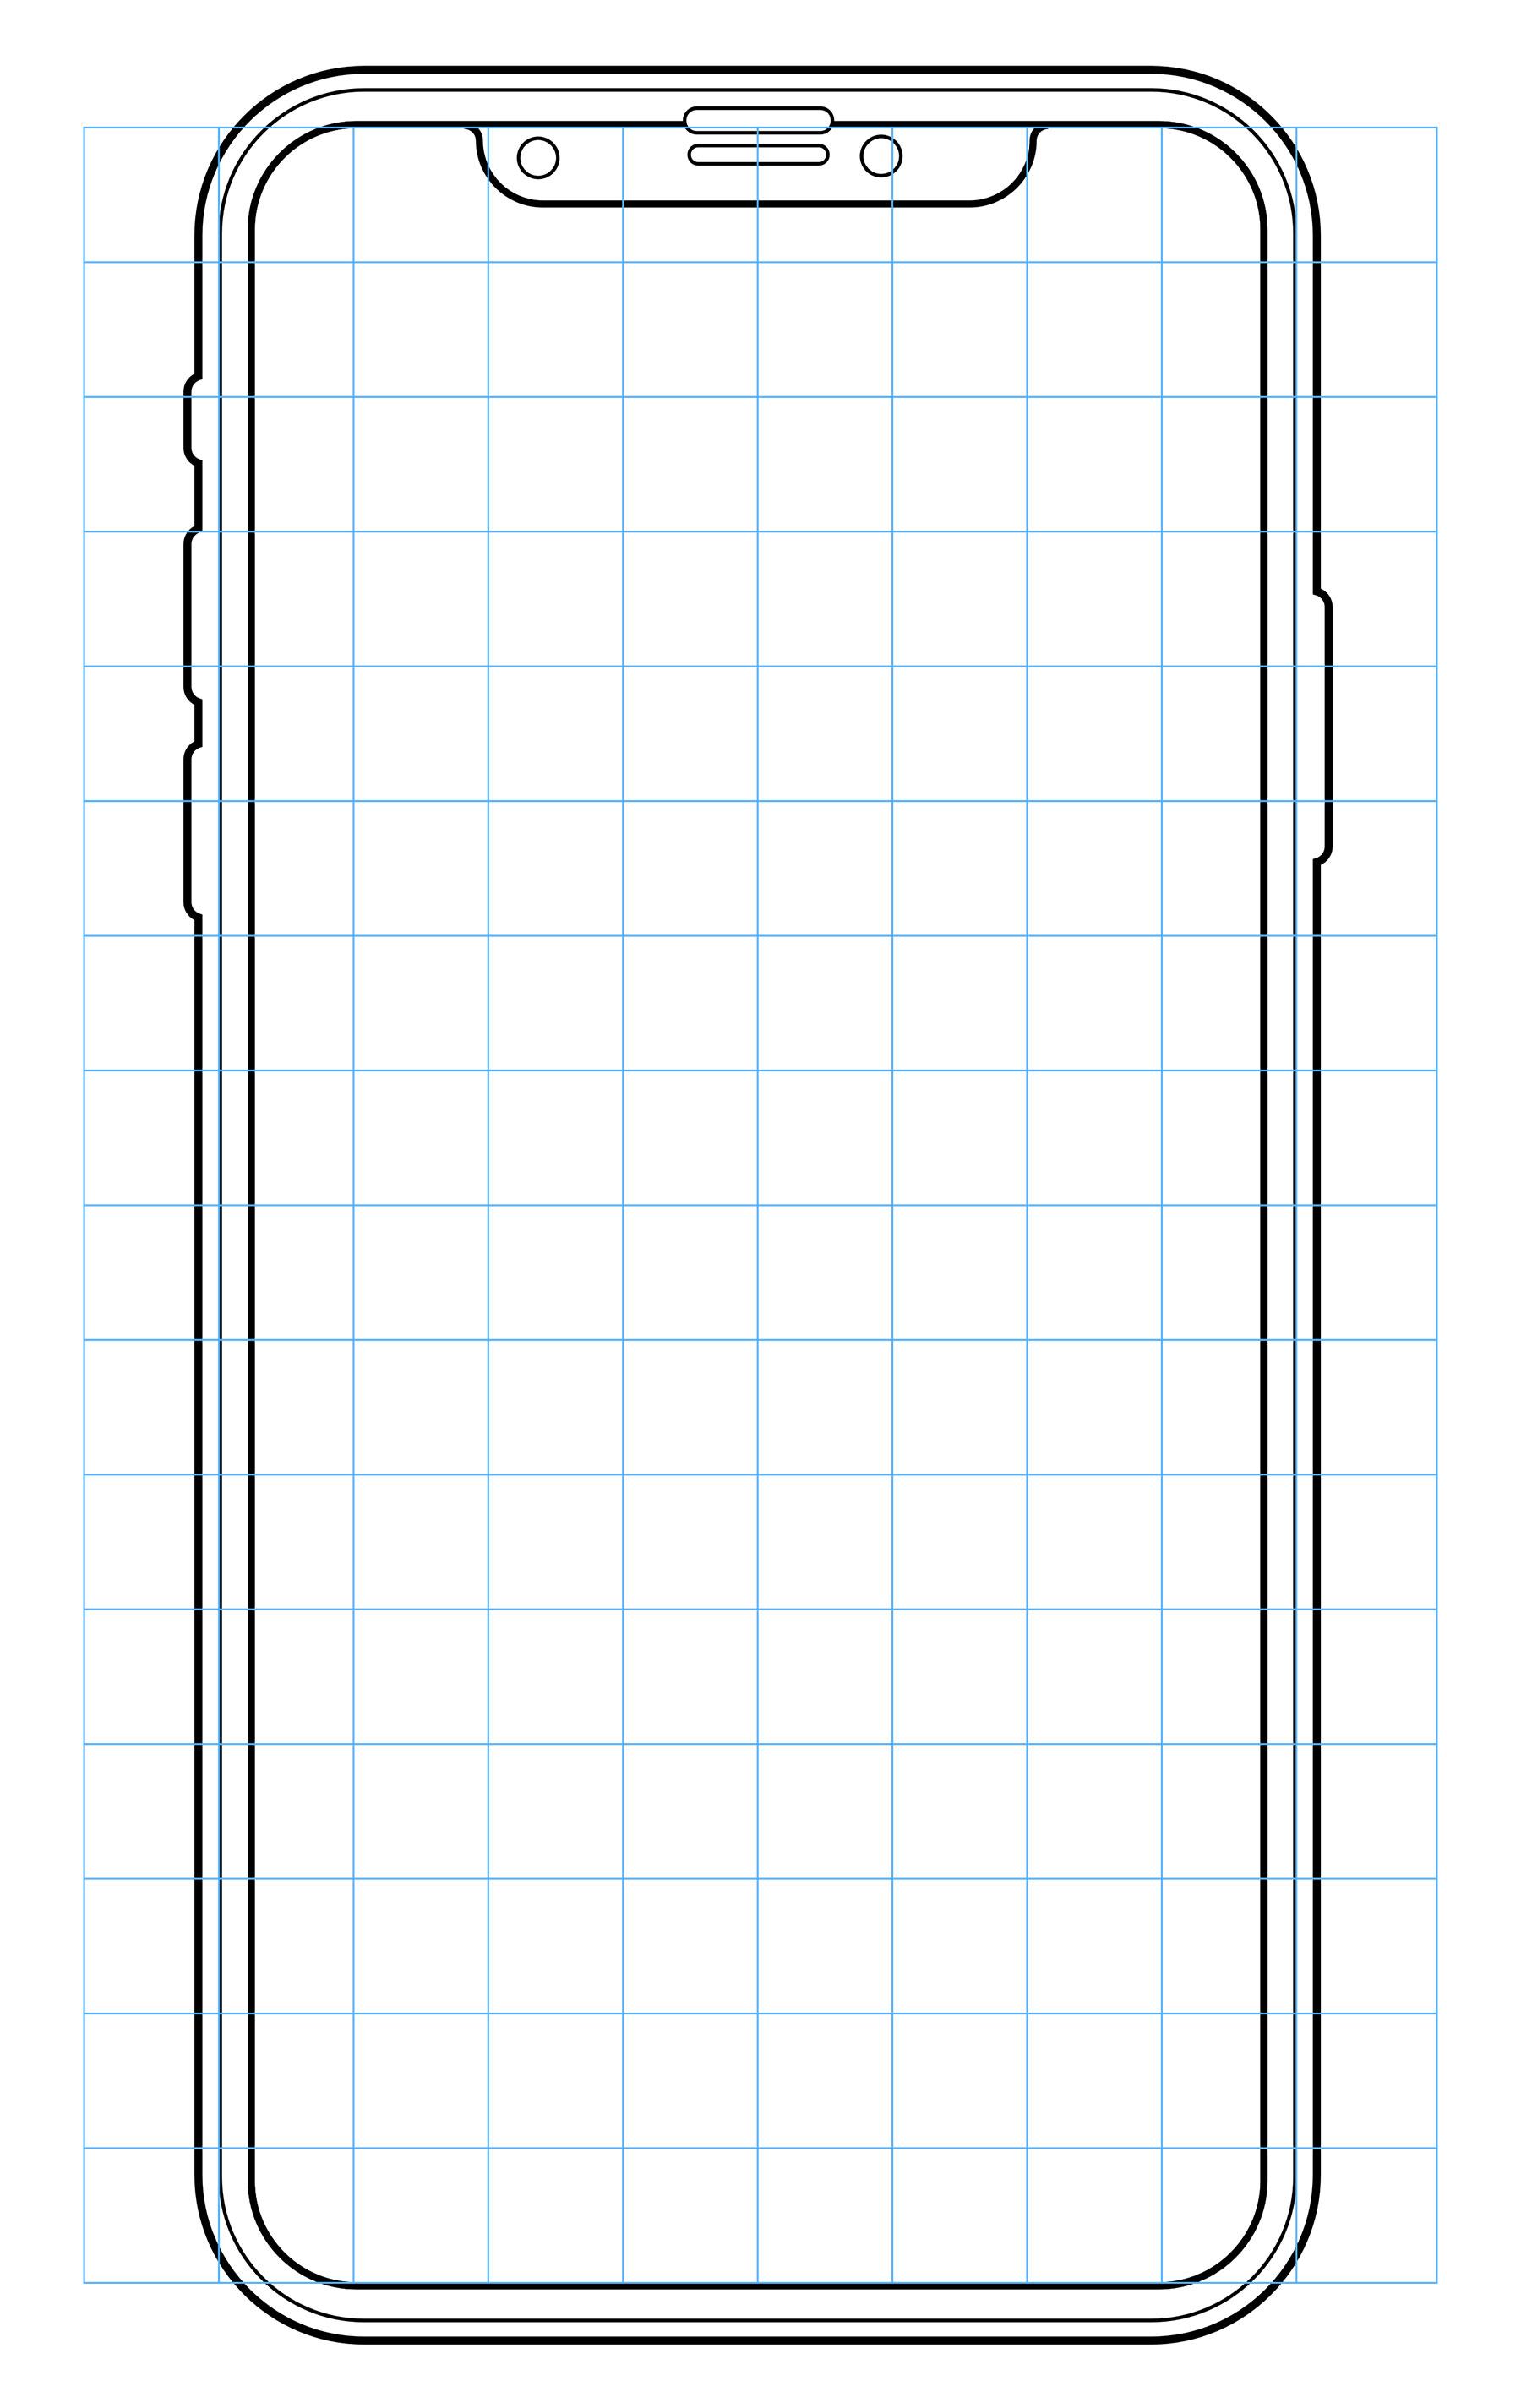 iPhone X 线框模板 sketch素材下载 样机素材-第1张